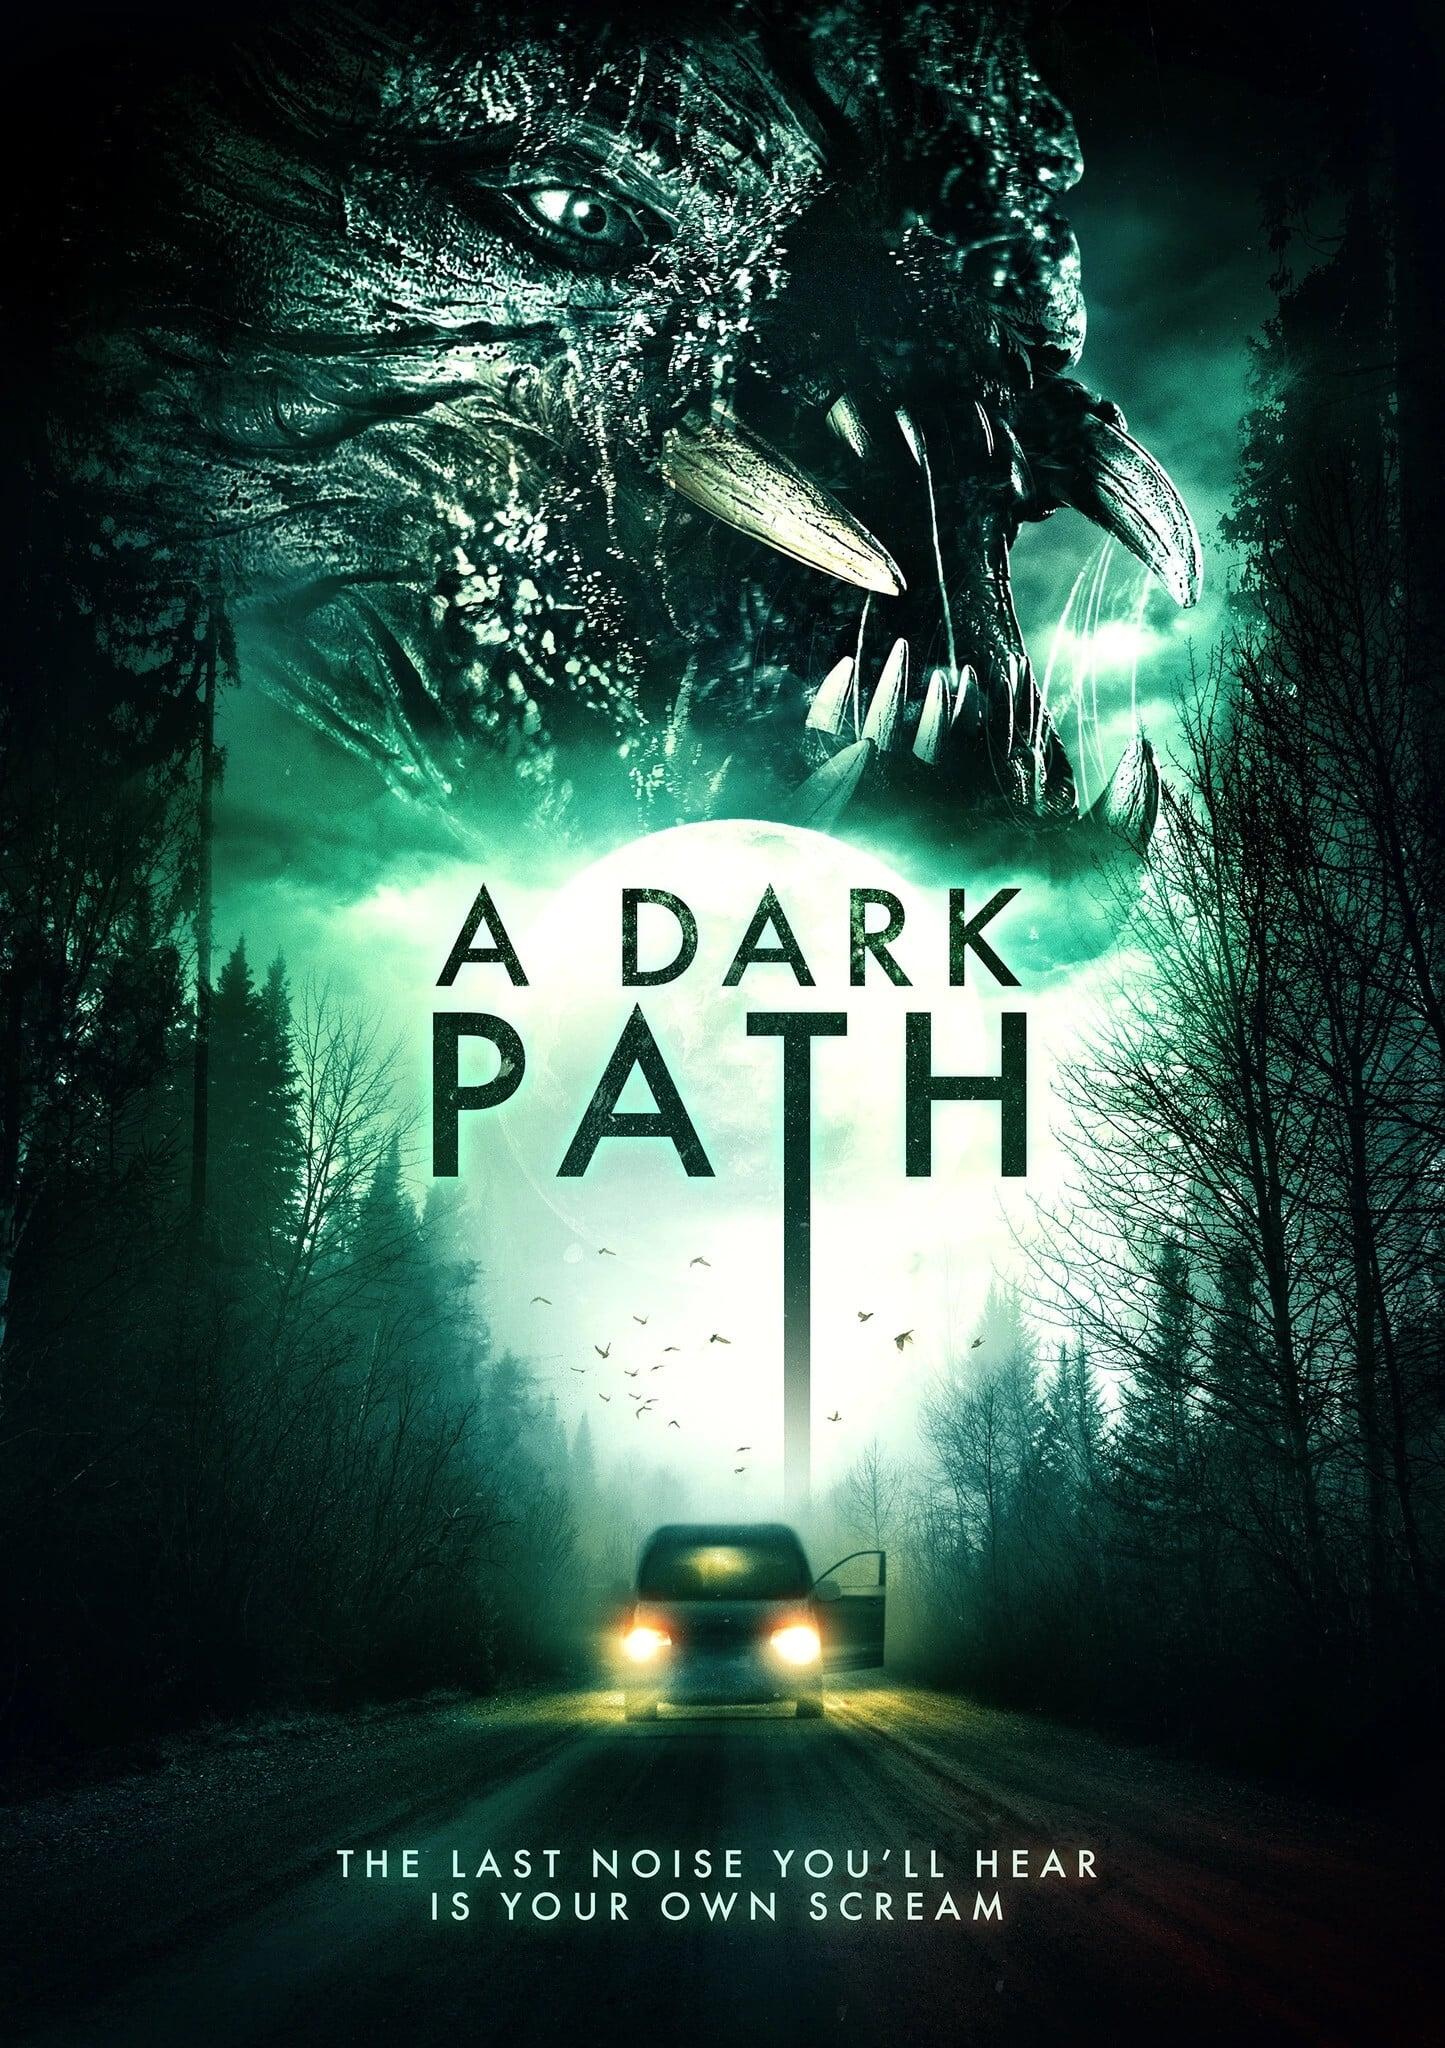 A Dark Path 2020 | 1080p WEB-DL DD5.1 [2.56 GB] | 720p WEB-Rip [757 MB] | 480p WEB-Rip [294 MB] | G-Drive